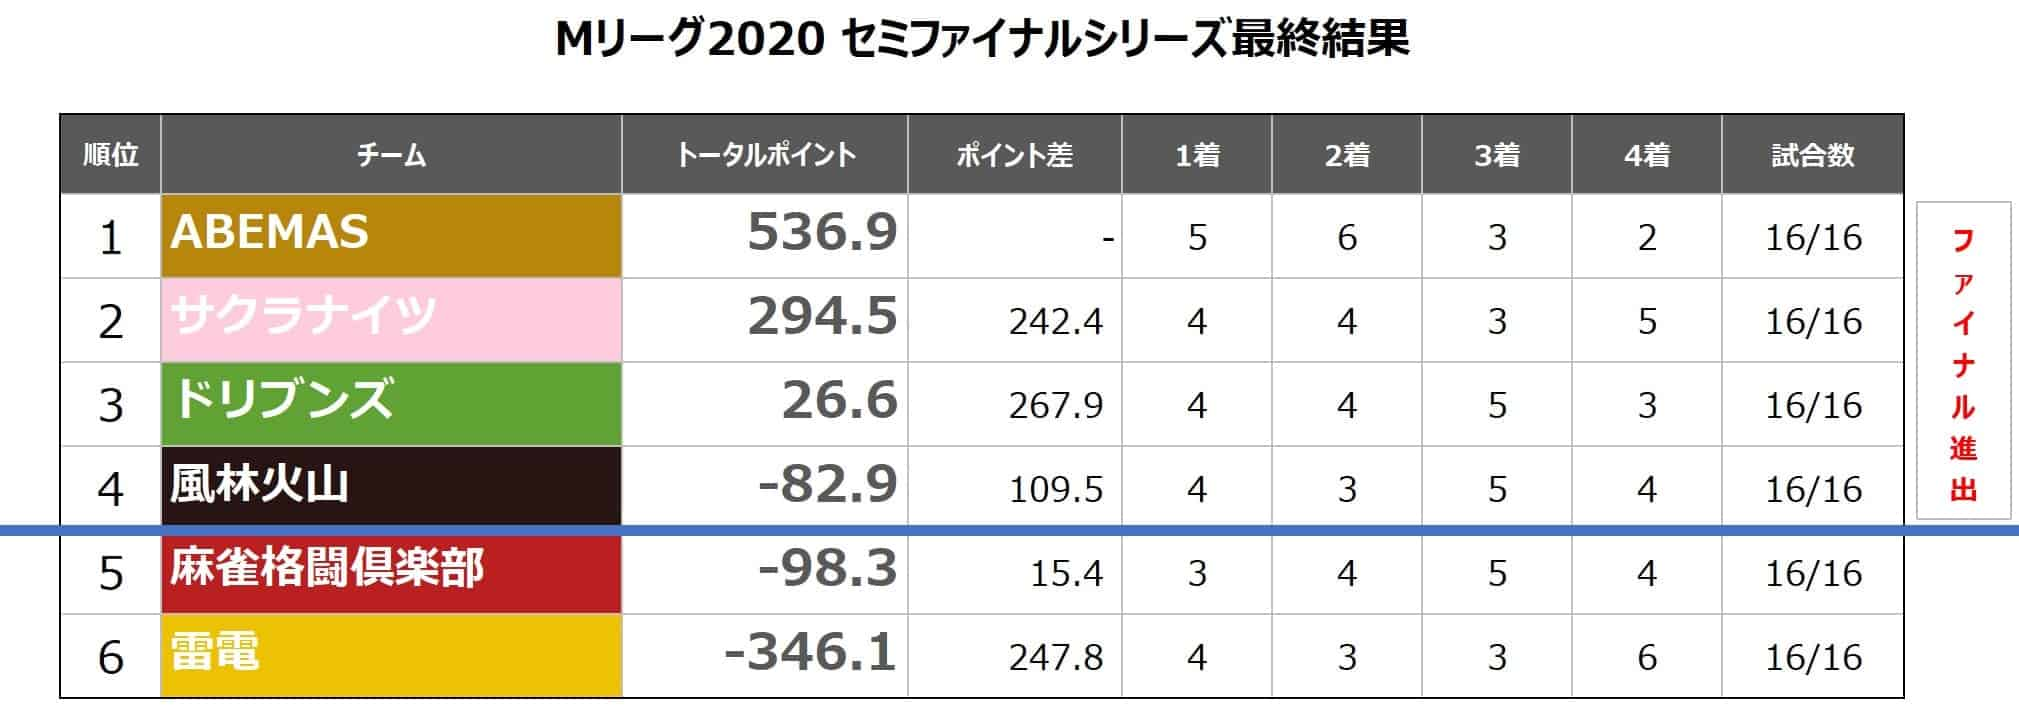 Mリーグ2020セミ_チームランキング20210430最終